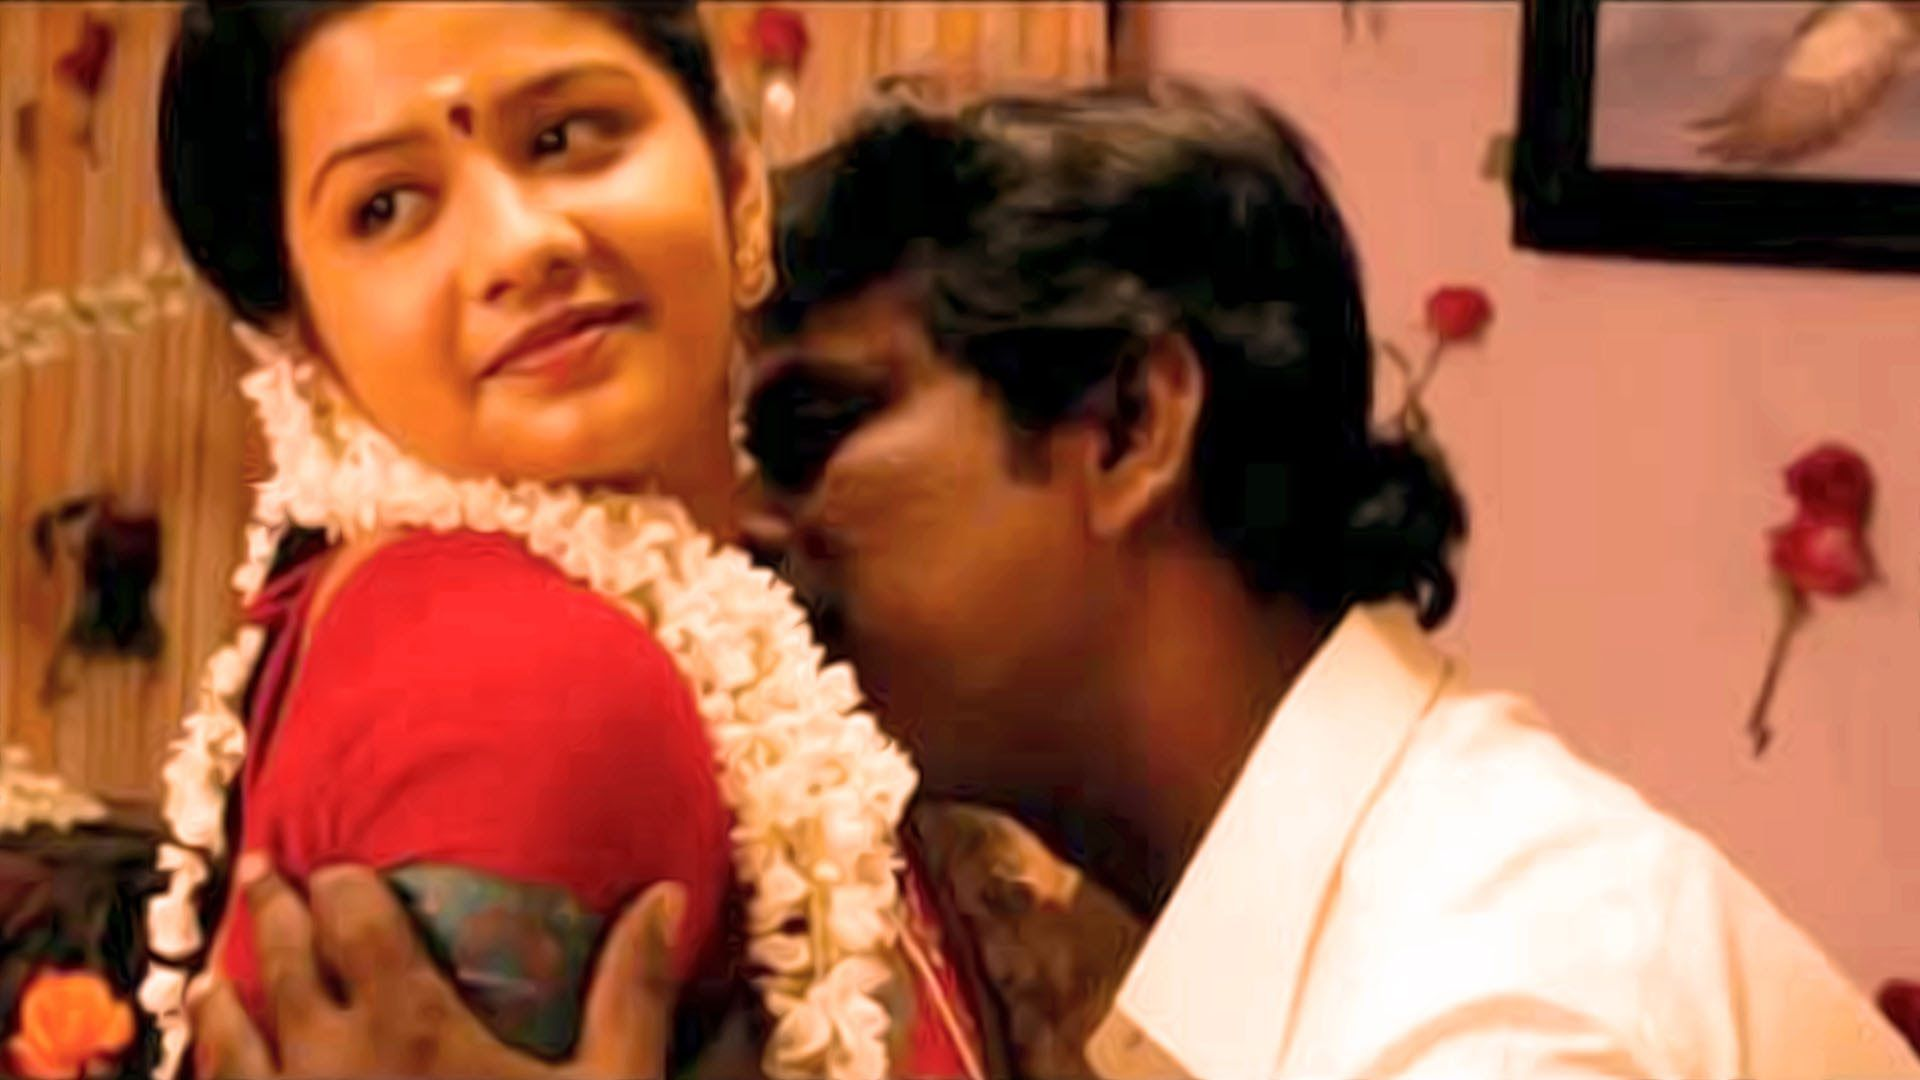 Hot Desi Mallu Couple First Night Masala Romantic Bed Scene